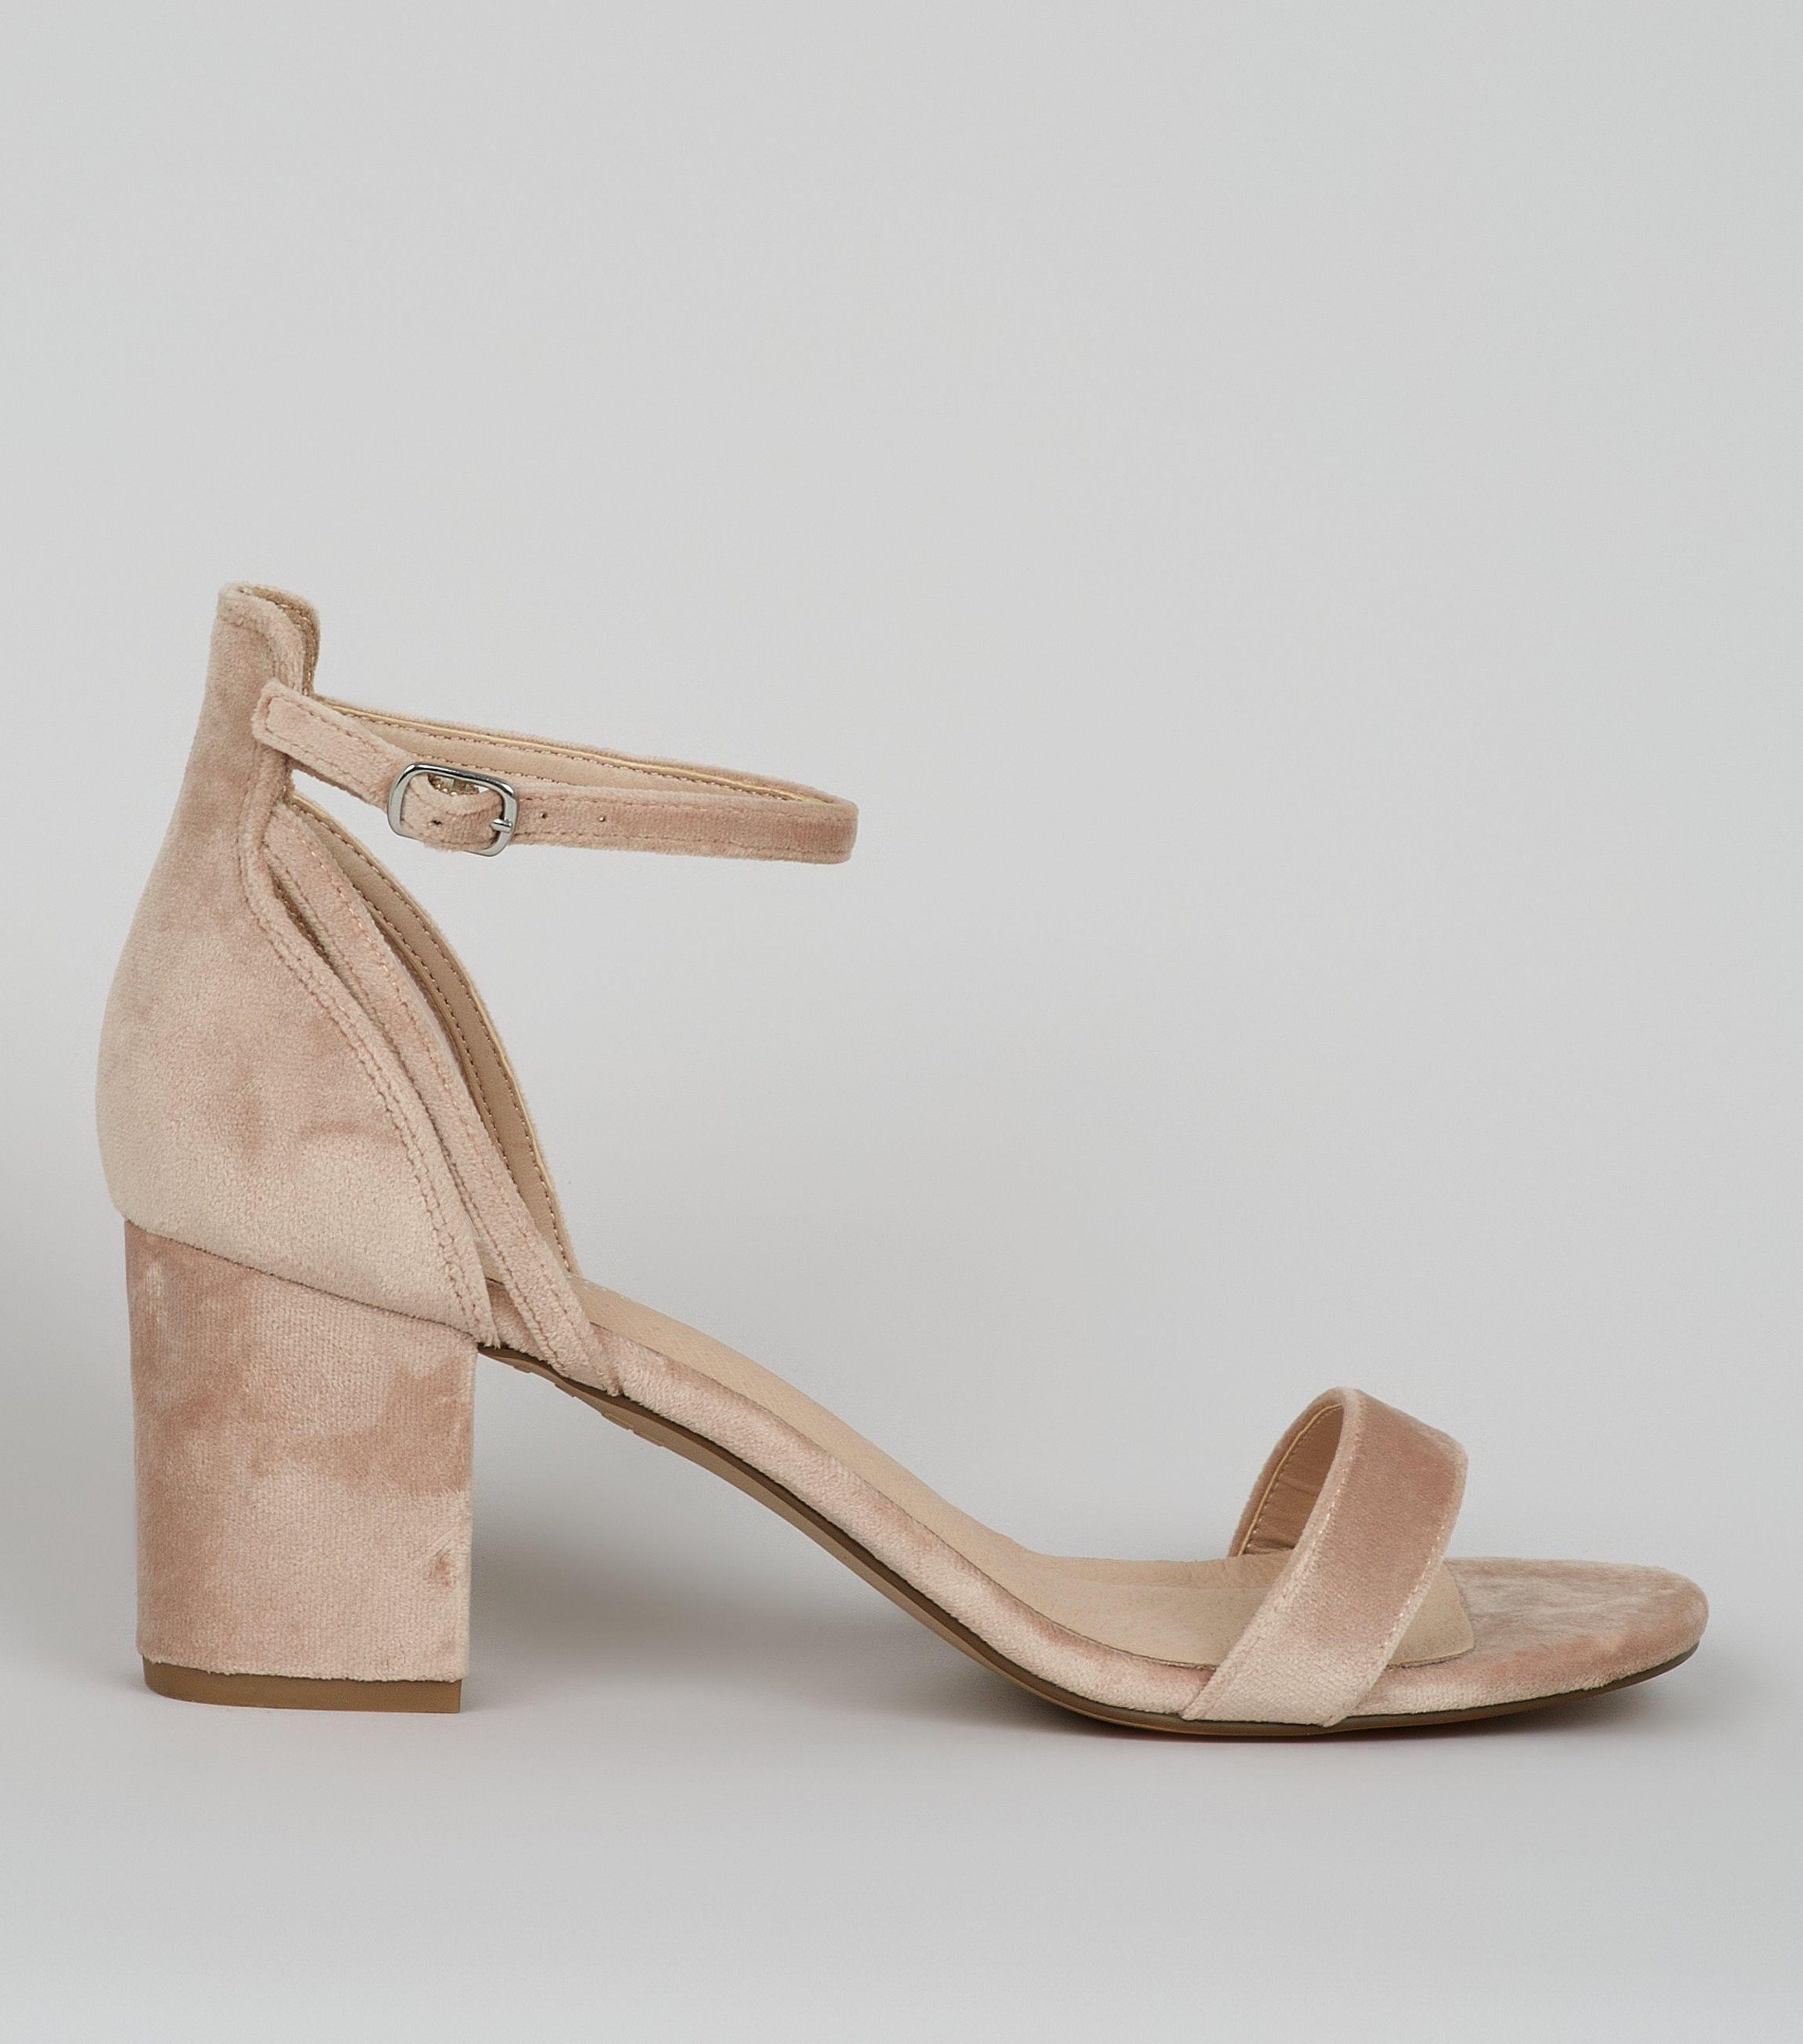 0980e490a13de7 New Look Nude Pink Velvet Low Block Heeled Sandals in Natural - Lyst